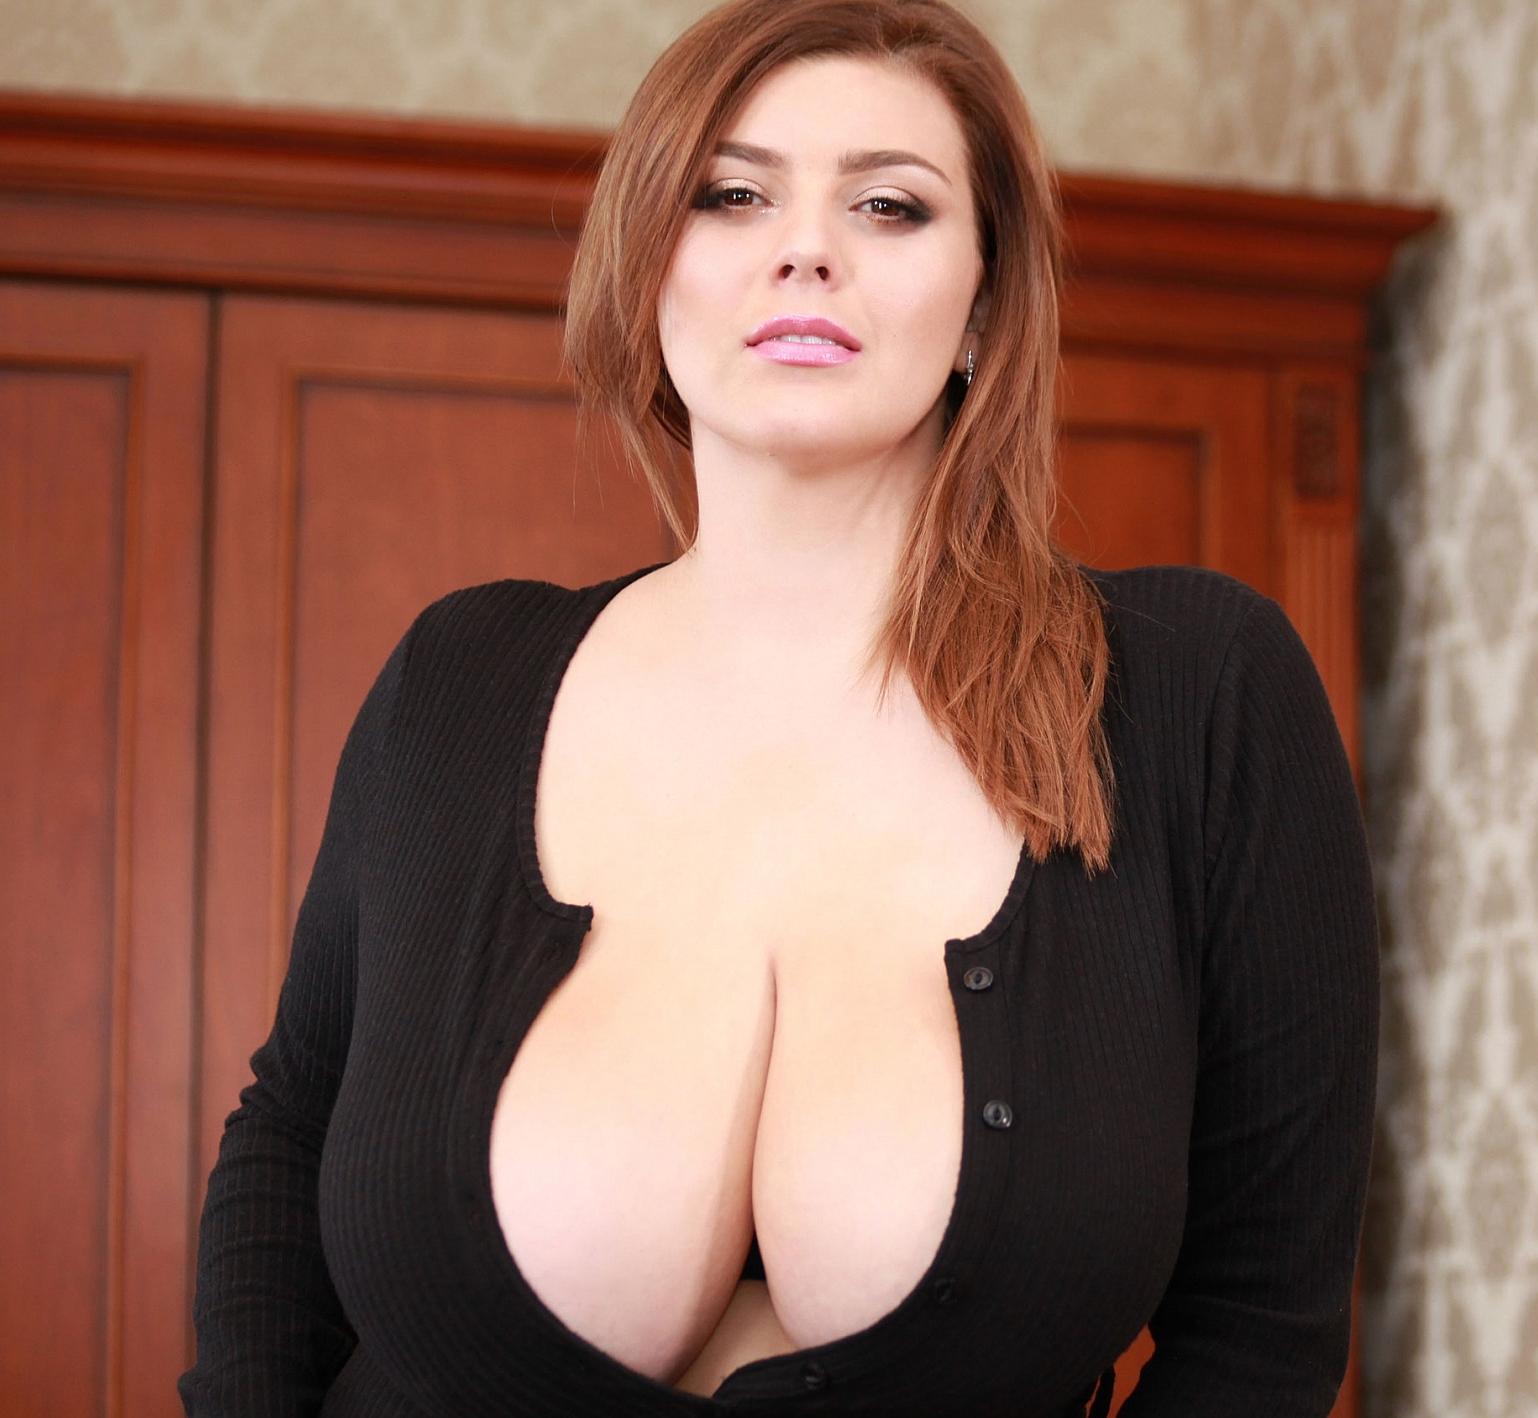 Suck Own Big Boobs Free Japan Porn Pics Hd Xxx